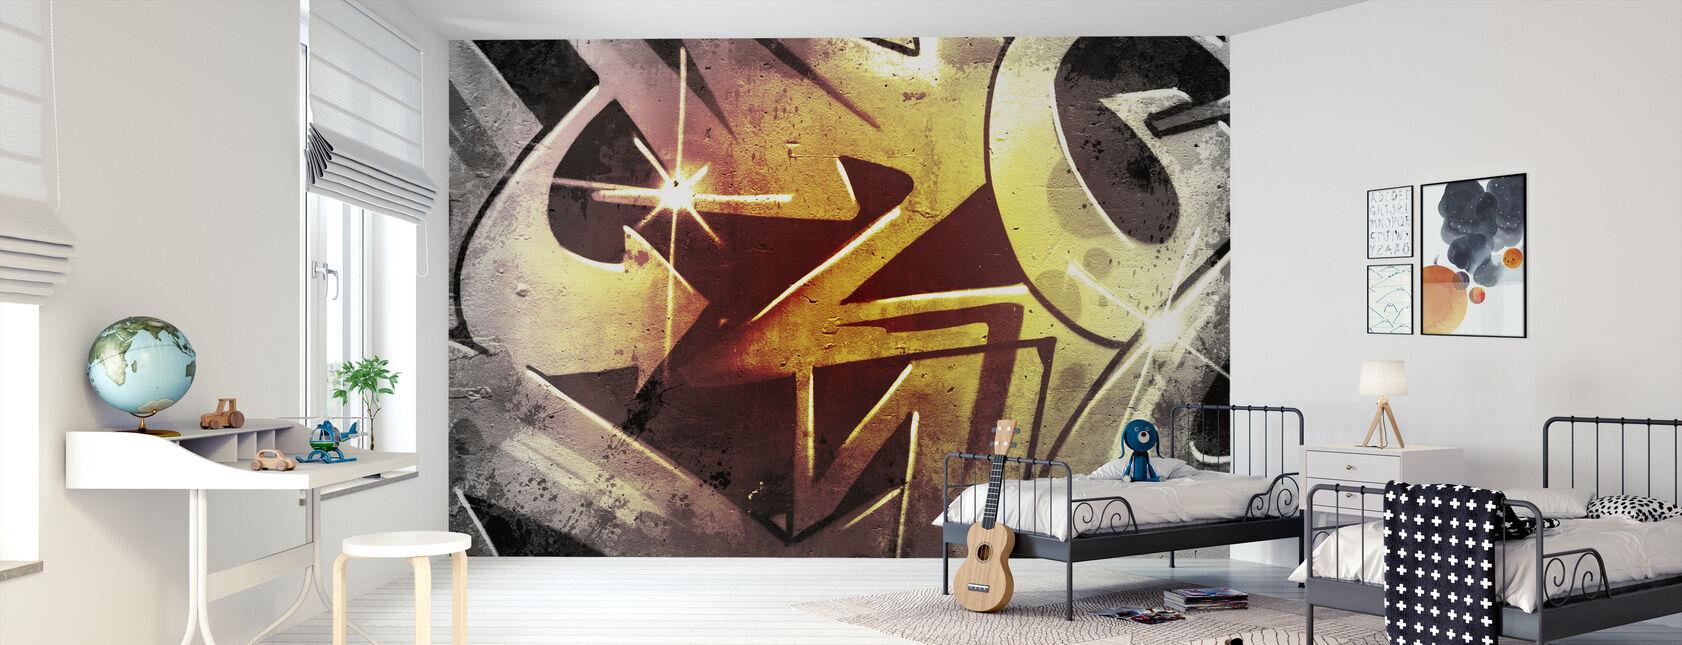 Graffiti & Gatukonst